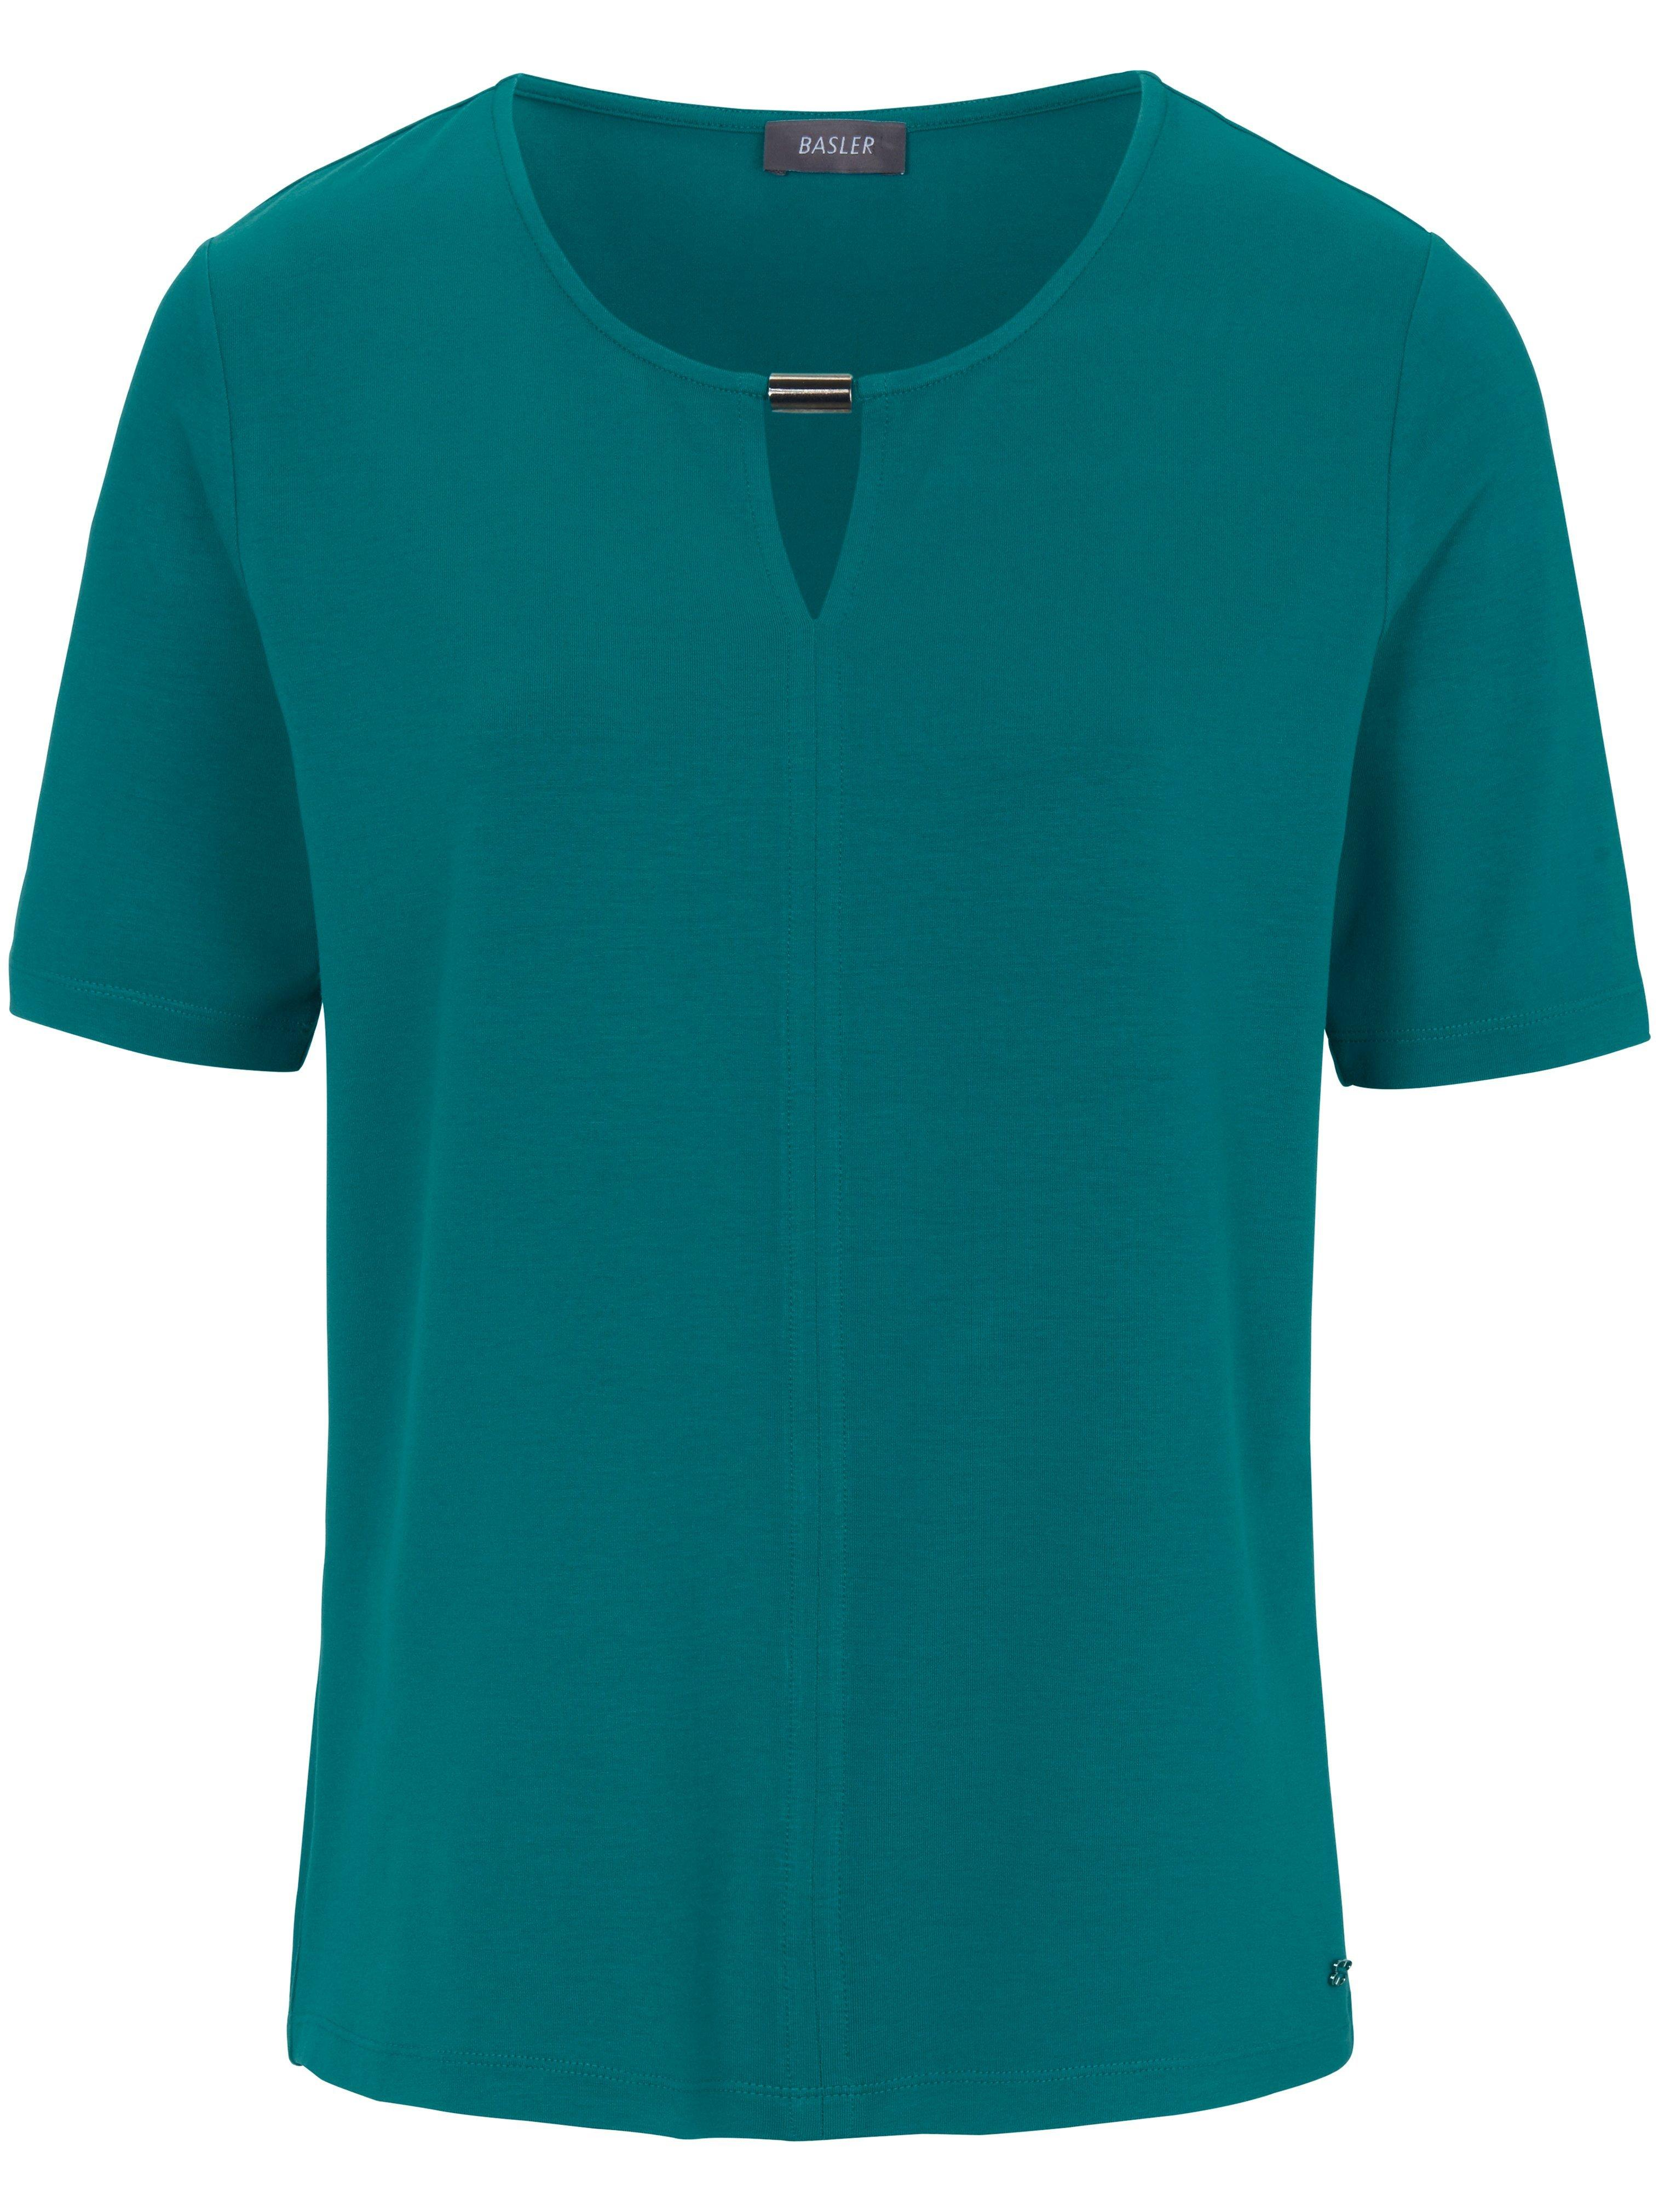 Damen Rundhals-Shirt Basler türkis | Plus Size |